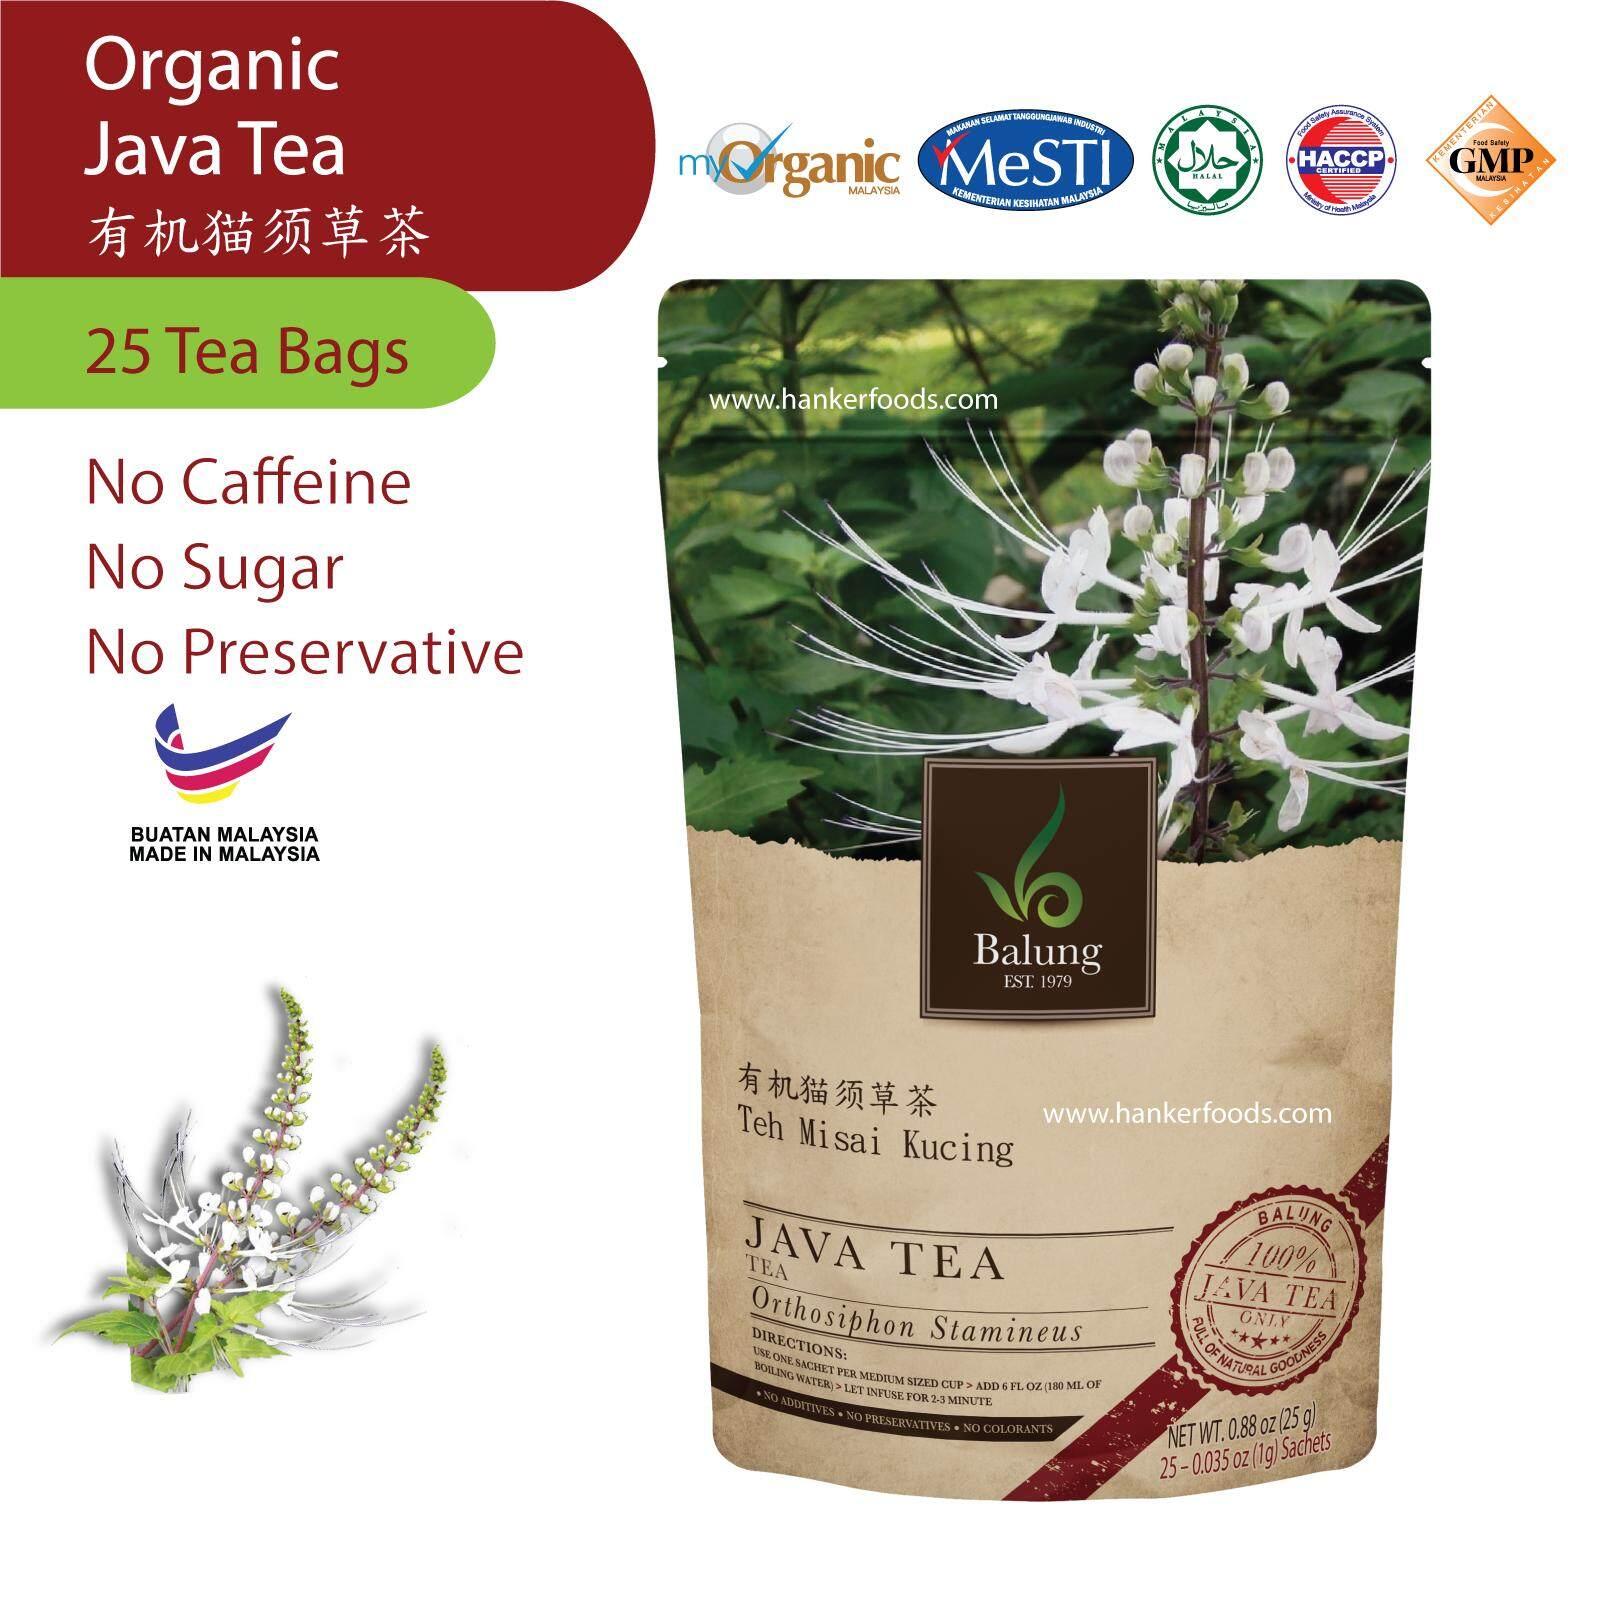 Java Tea (Teh Misai Kucing) 25 Tea bags 有机猫须茶